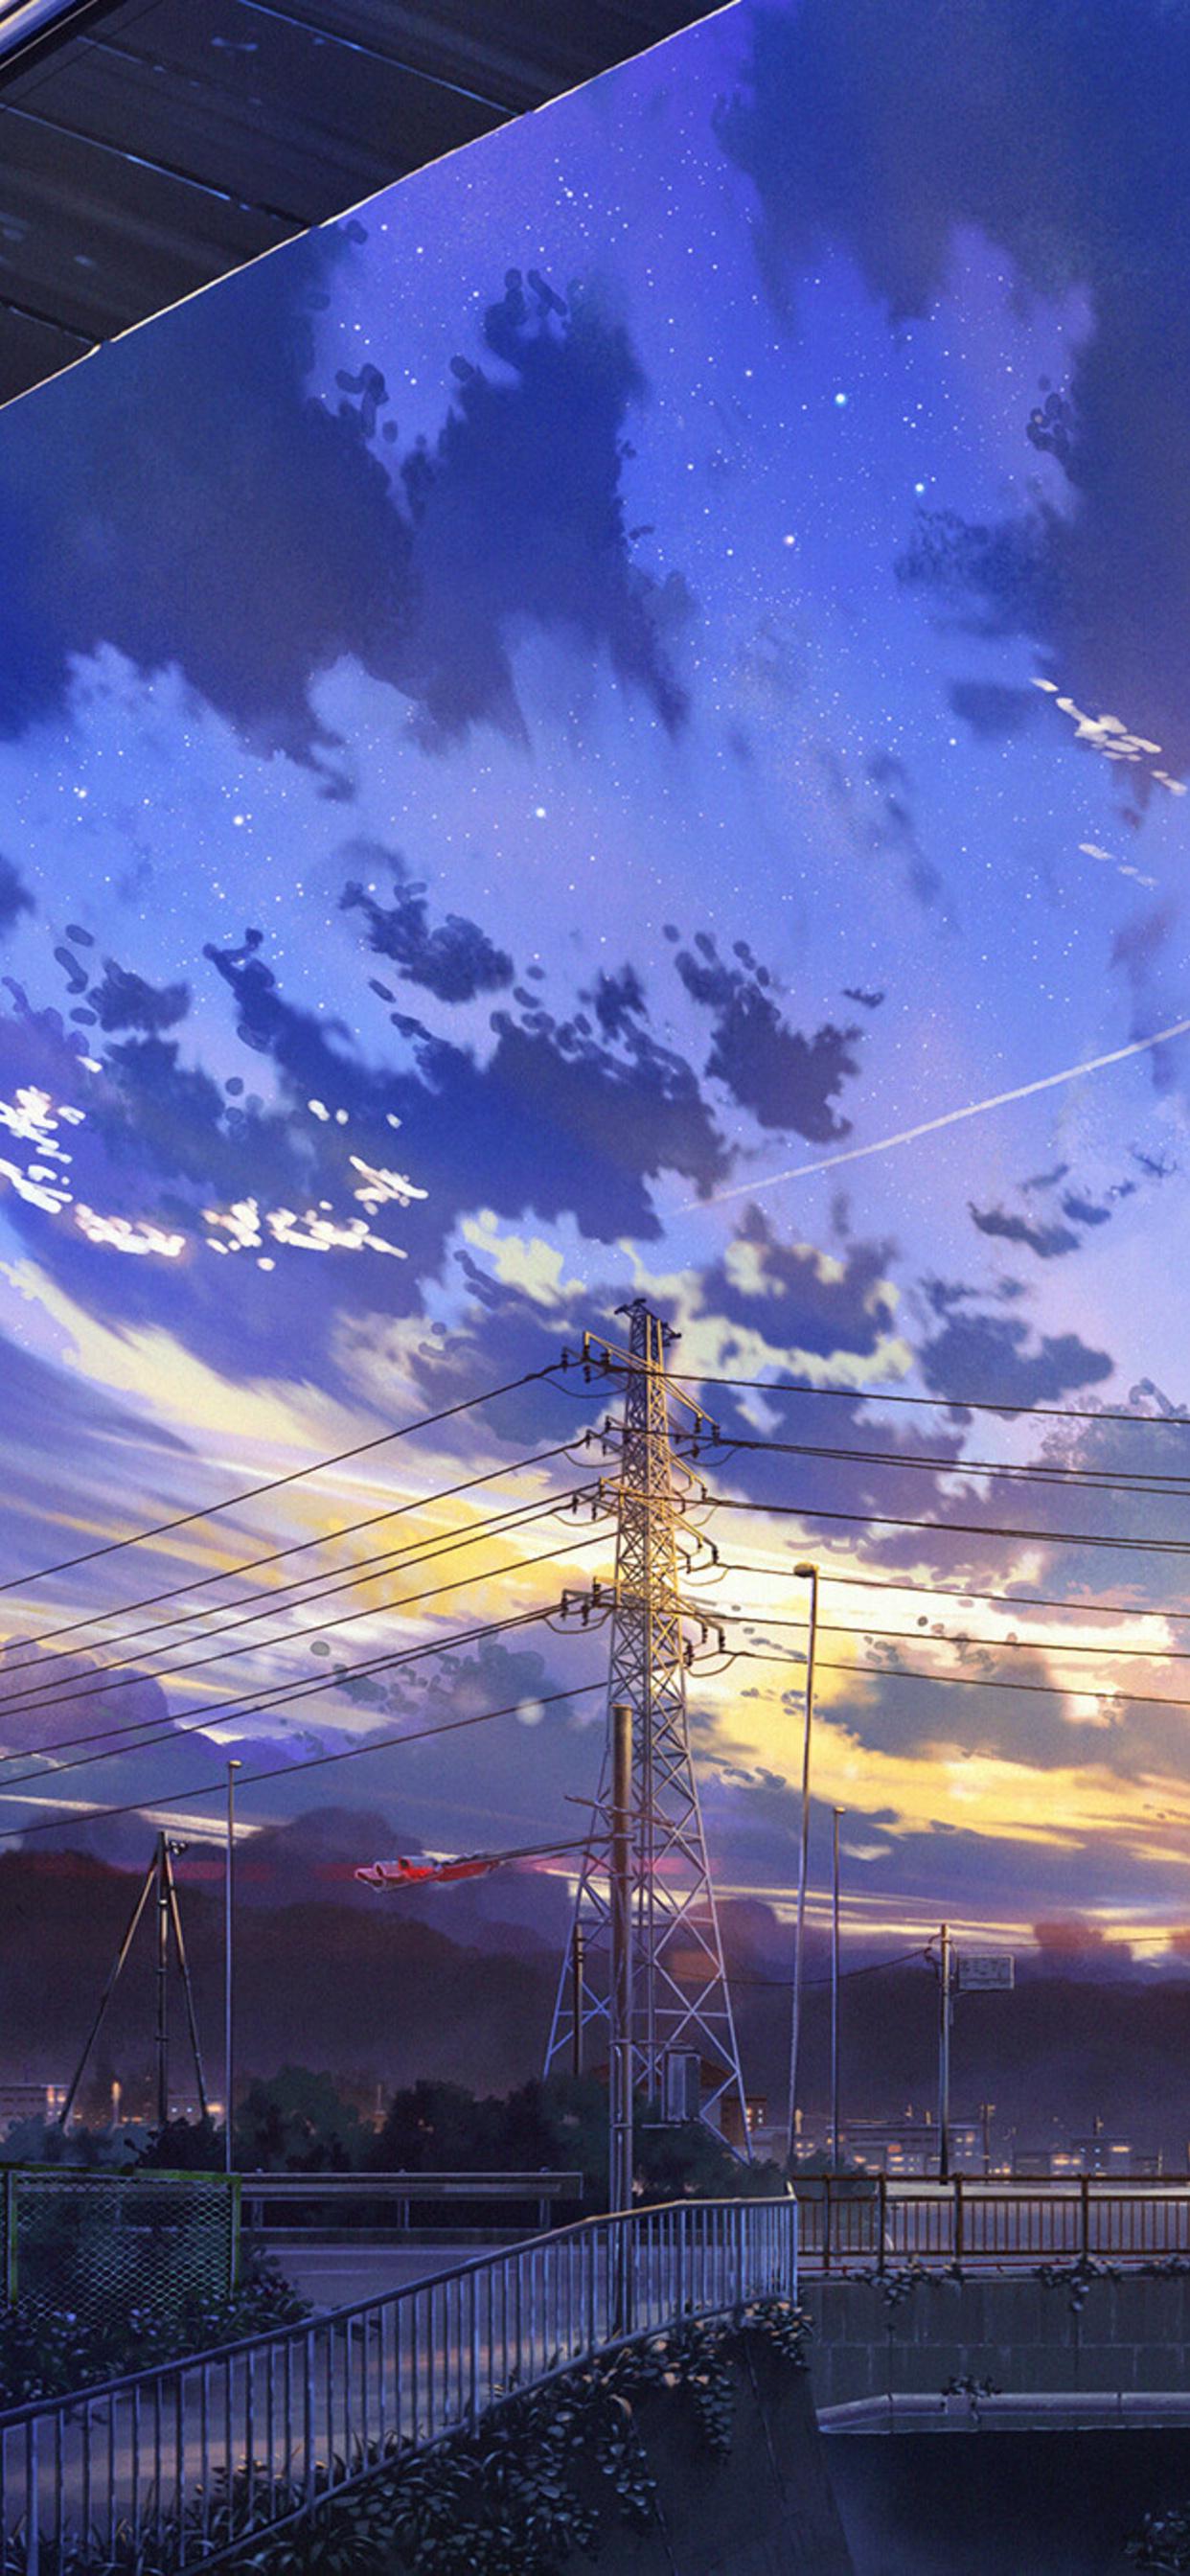 Beautiful anime art japanese city anime animeart japan japanese futuristic cars bolides t in 2020 anime scenery wallpaper scenery wallpaper hd wallpaper 4k. 1242x2688 Japan City Digital Art Iphone XS MAX HD 4k ...